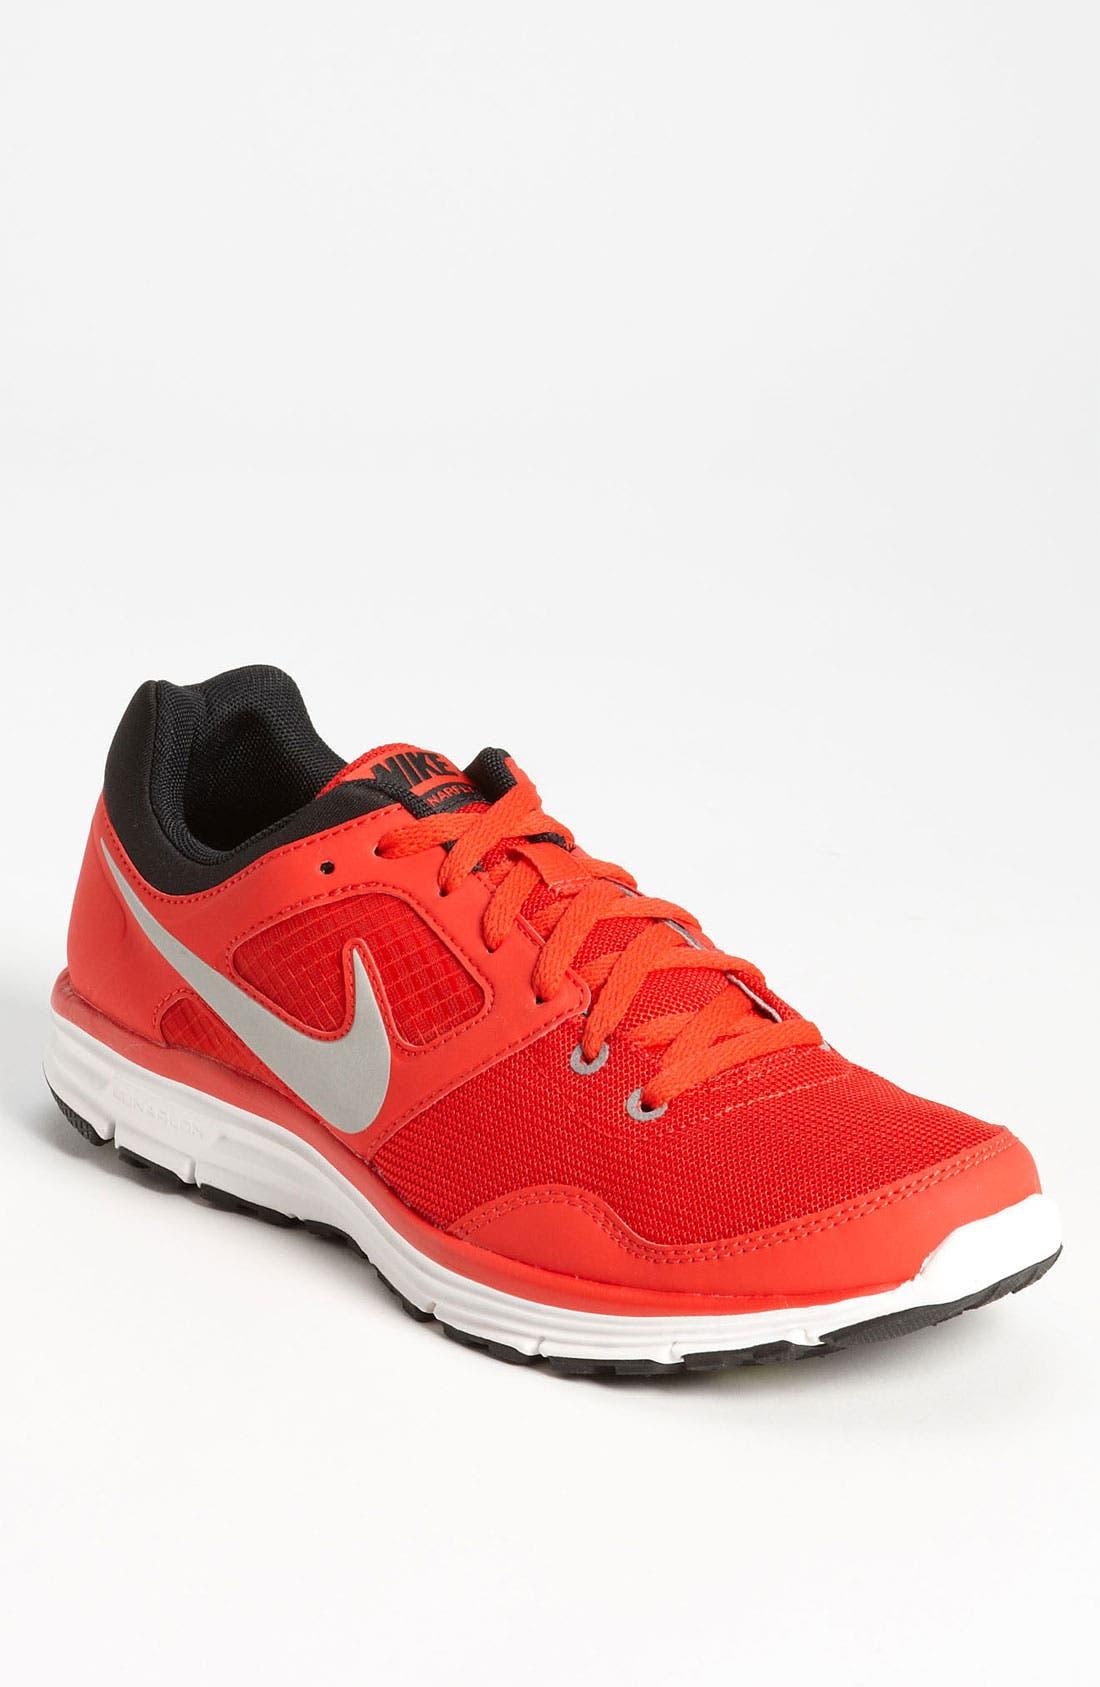 Alternate Image 1 Selected - Nike 'LunarFly+ 4' Running Shoe (Men)